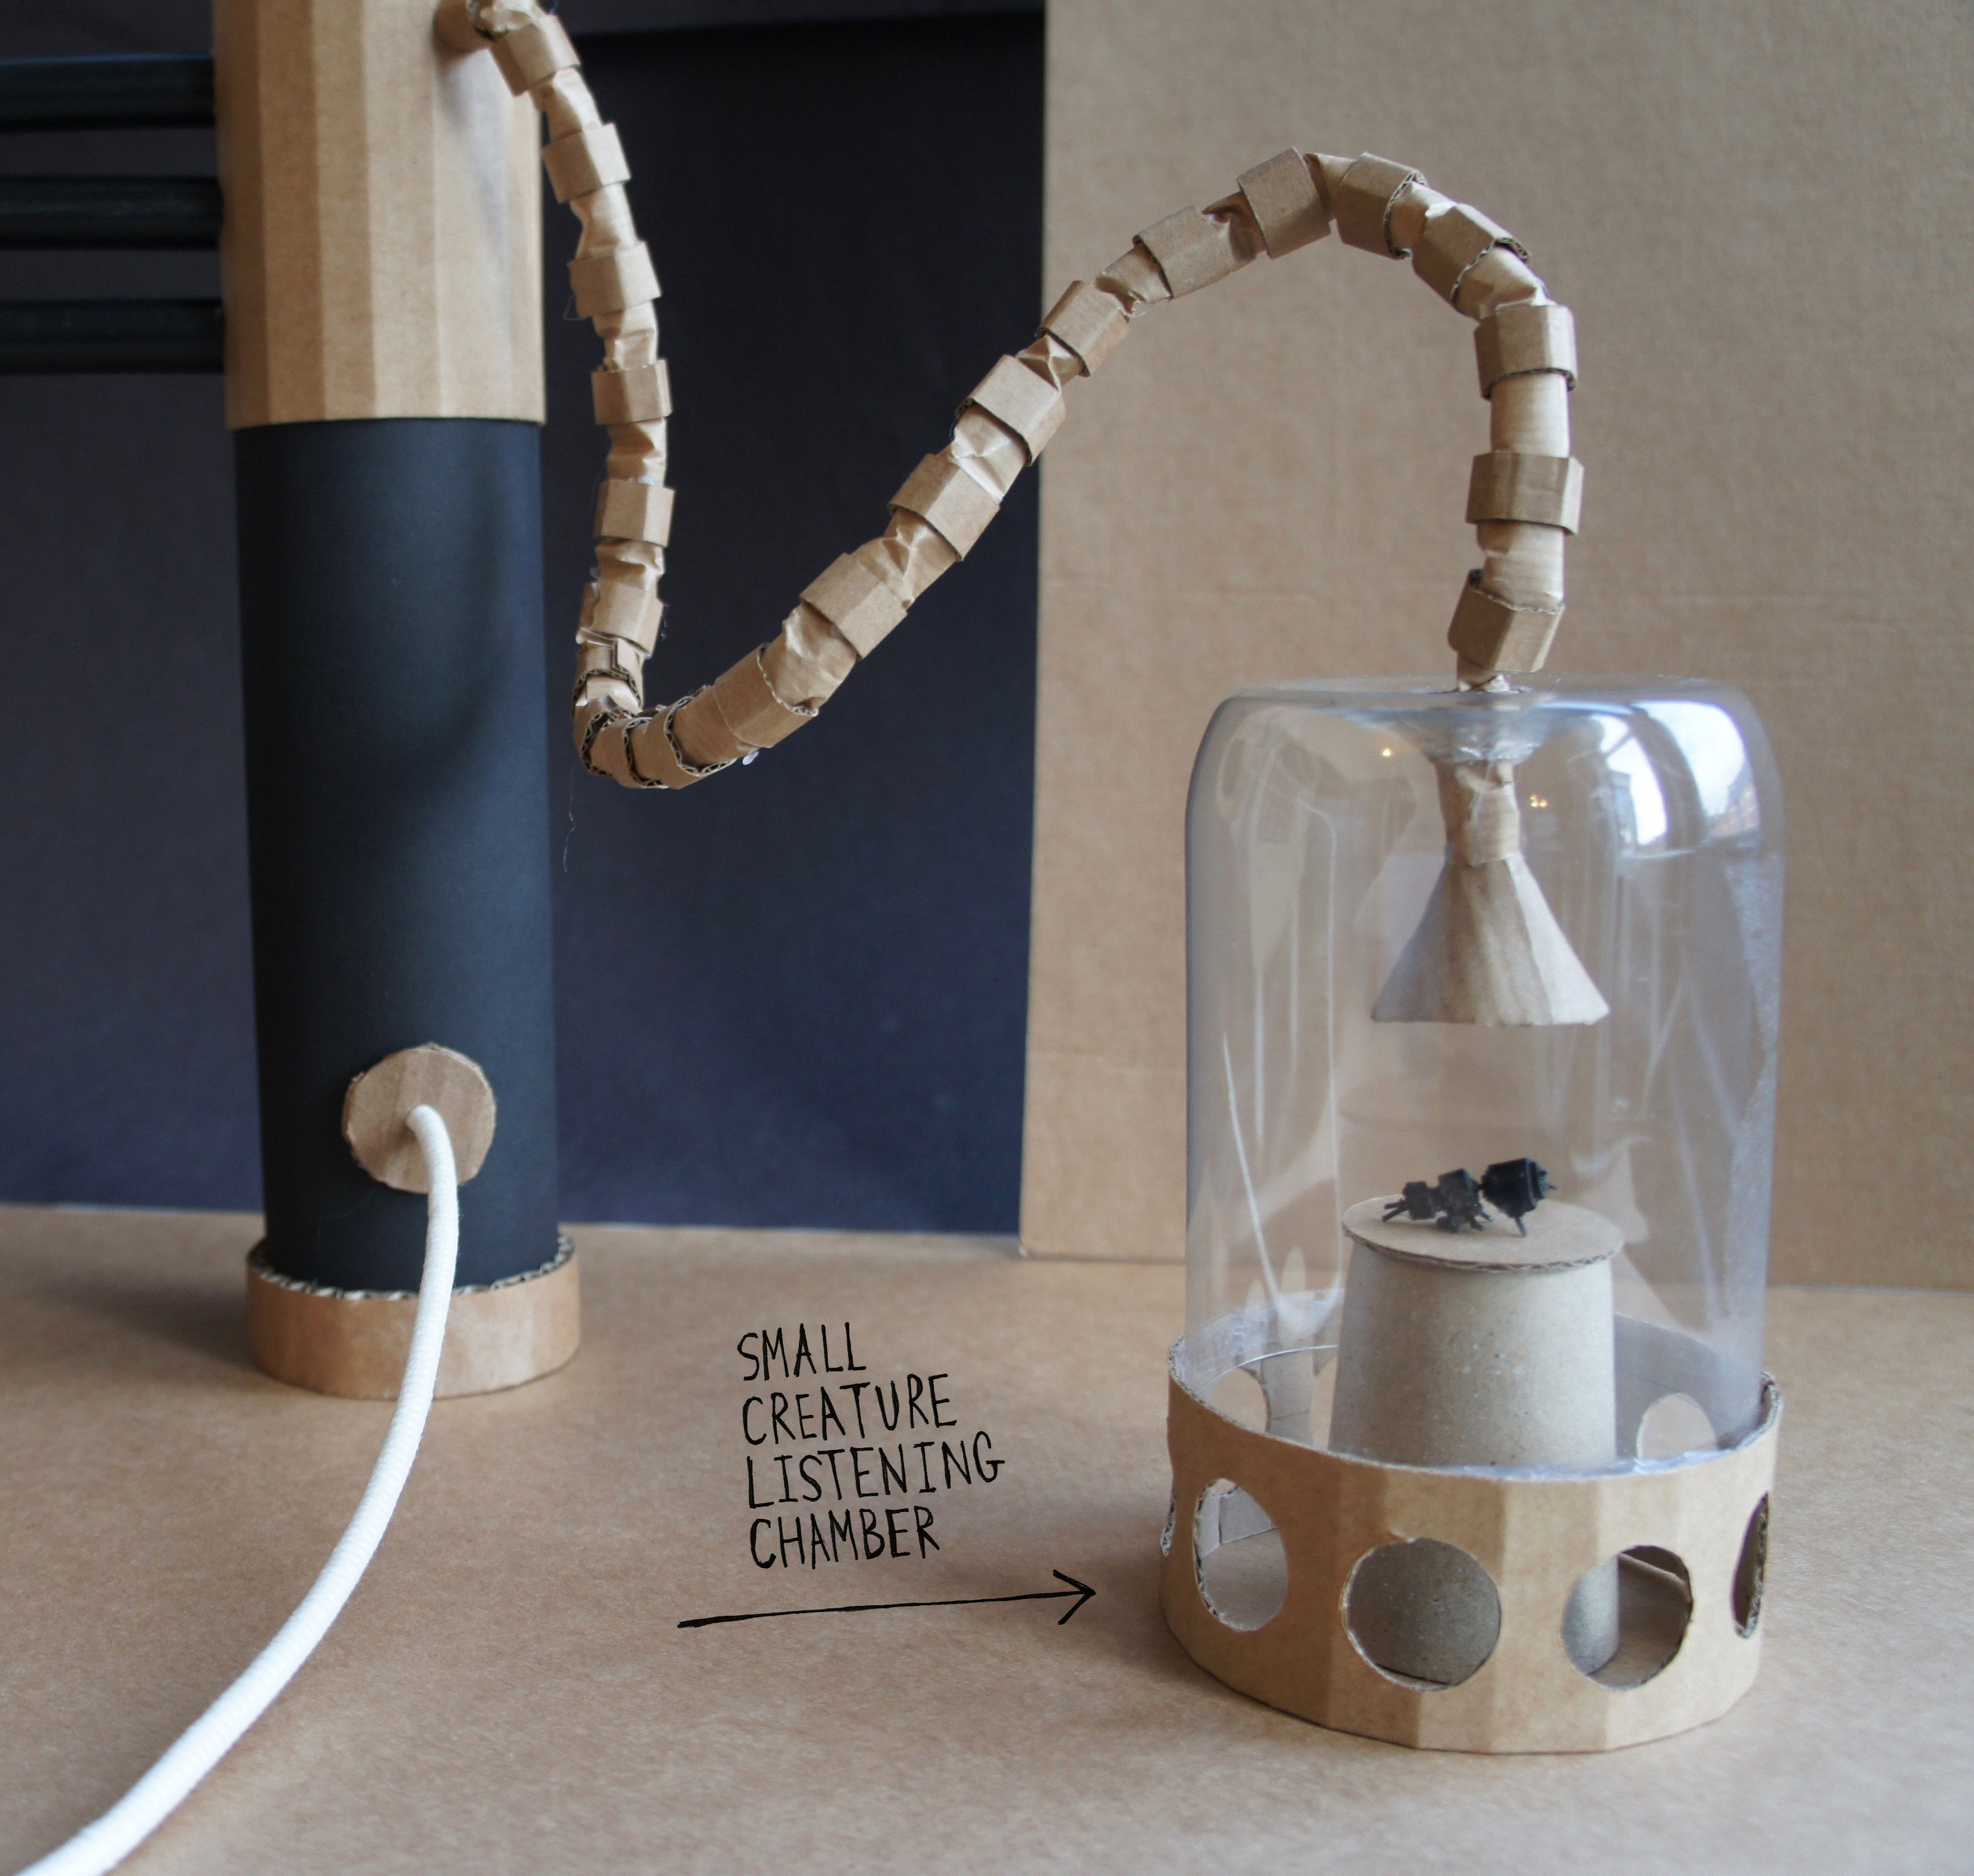 Creature Listening Chamber